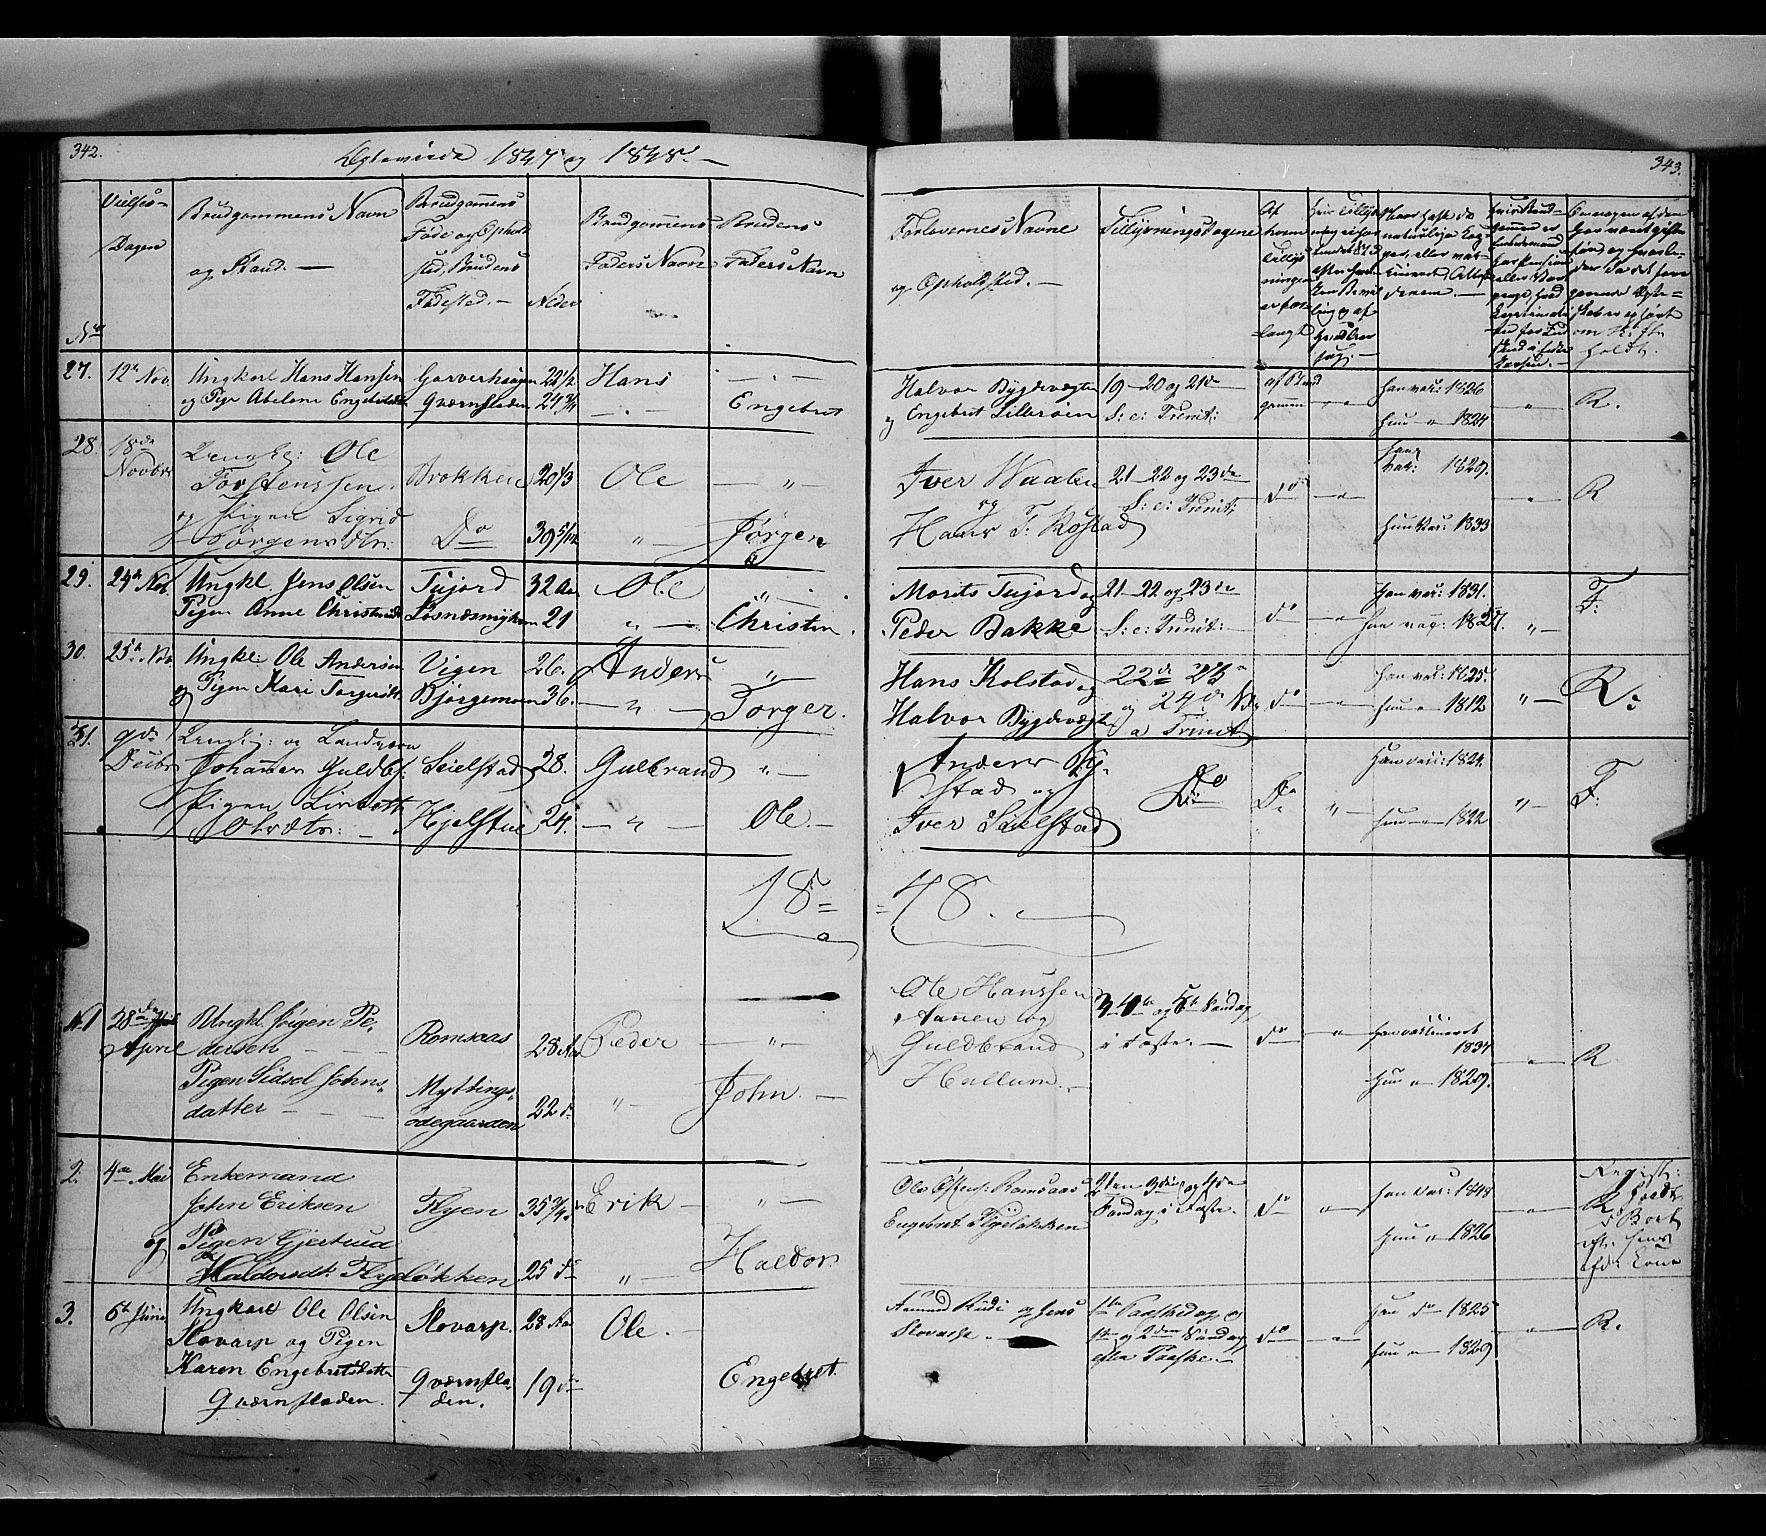 SAH, Ringebu prestekontor, Ministerialbok nr. 5, 1839-1848, s. 342-343